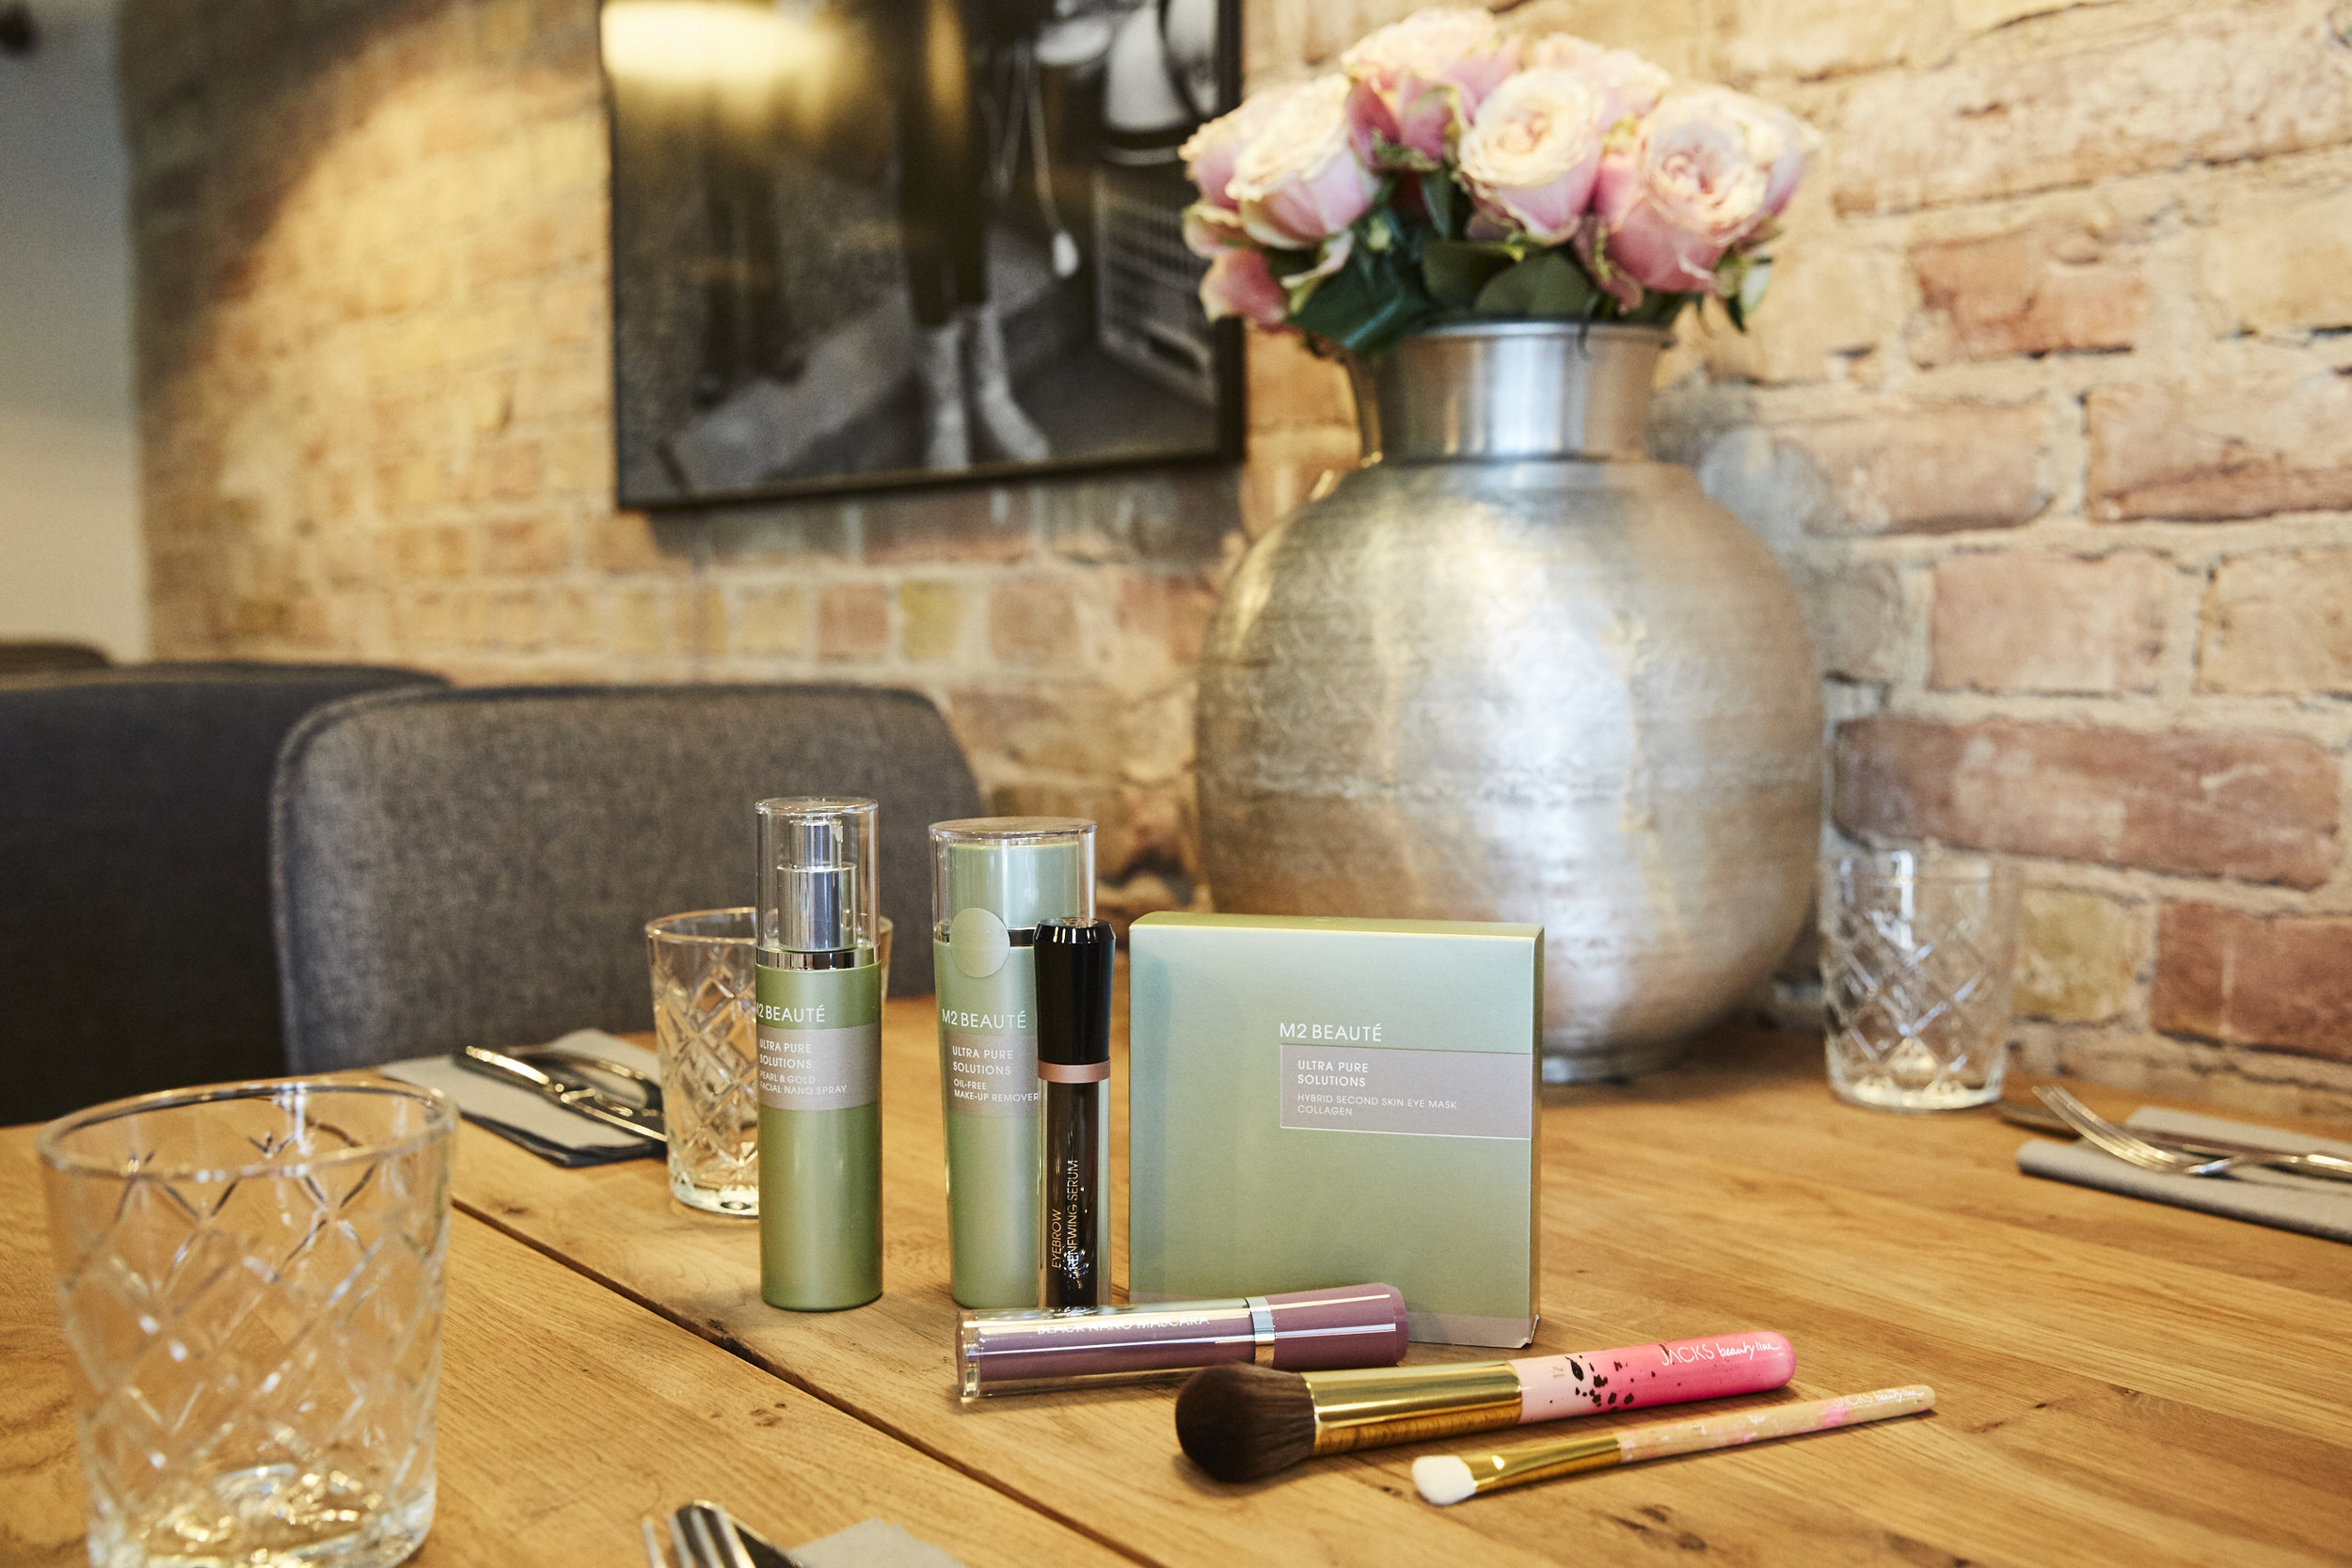 M2 BEAUTÉ Produkte mit JACKS beauty line Pinseln